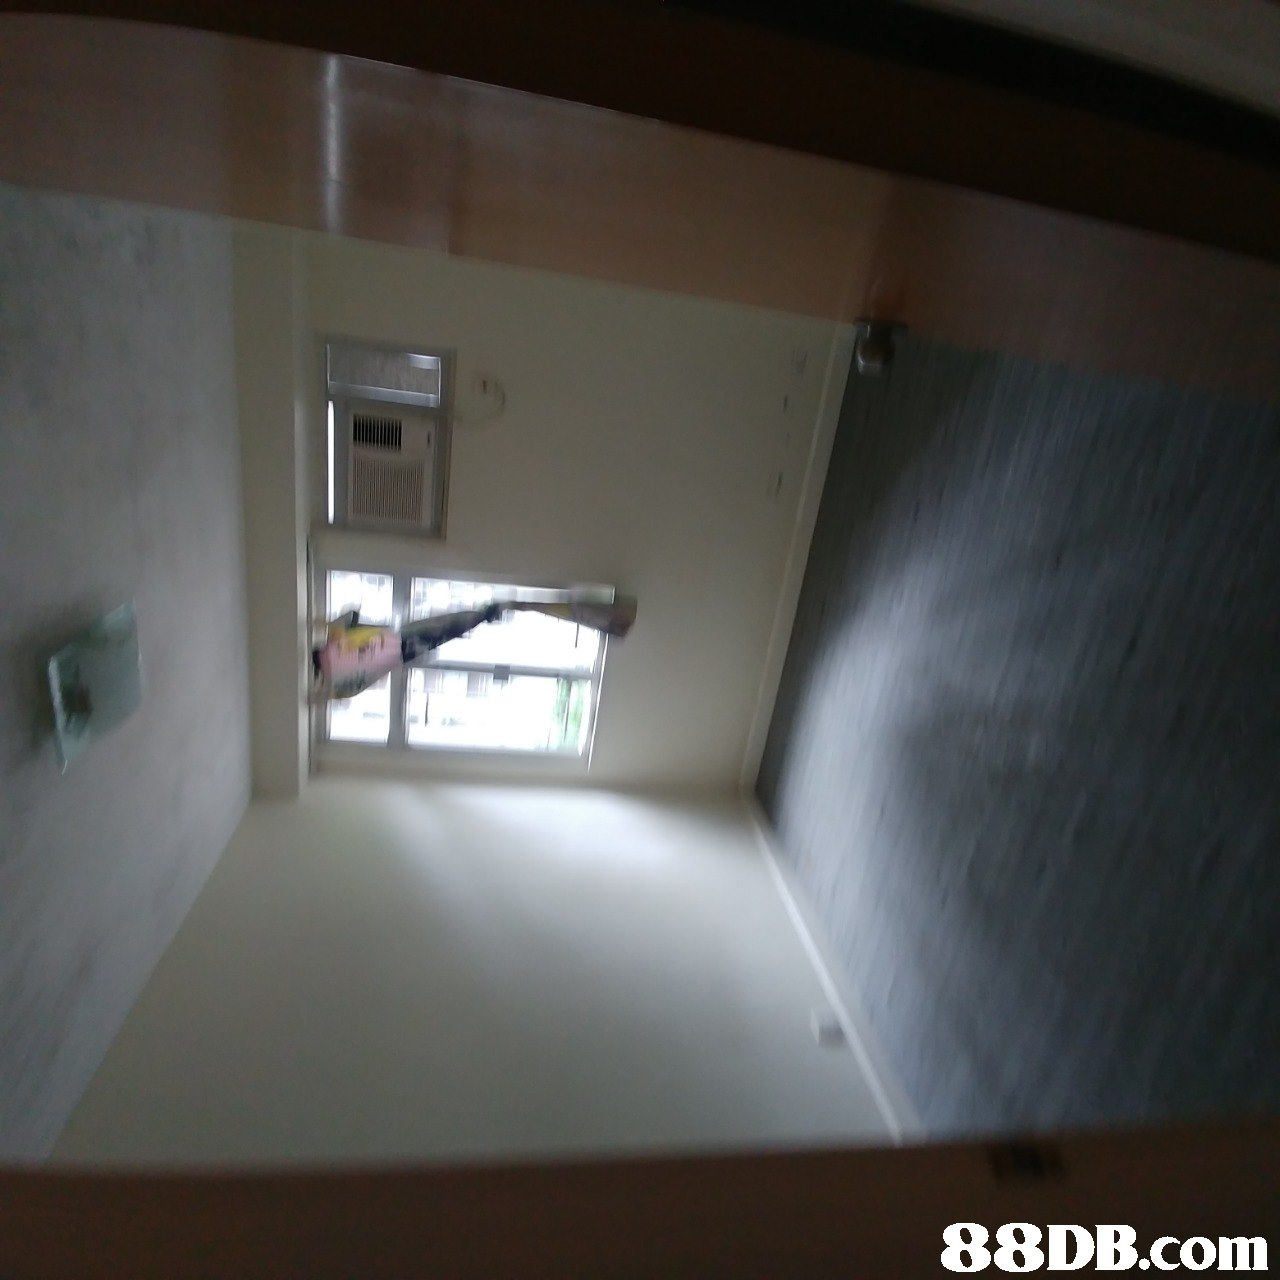 property,room,floor,home,daylighting